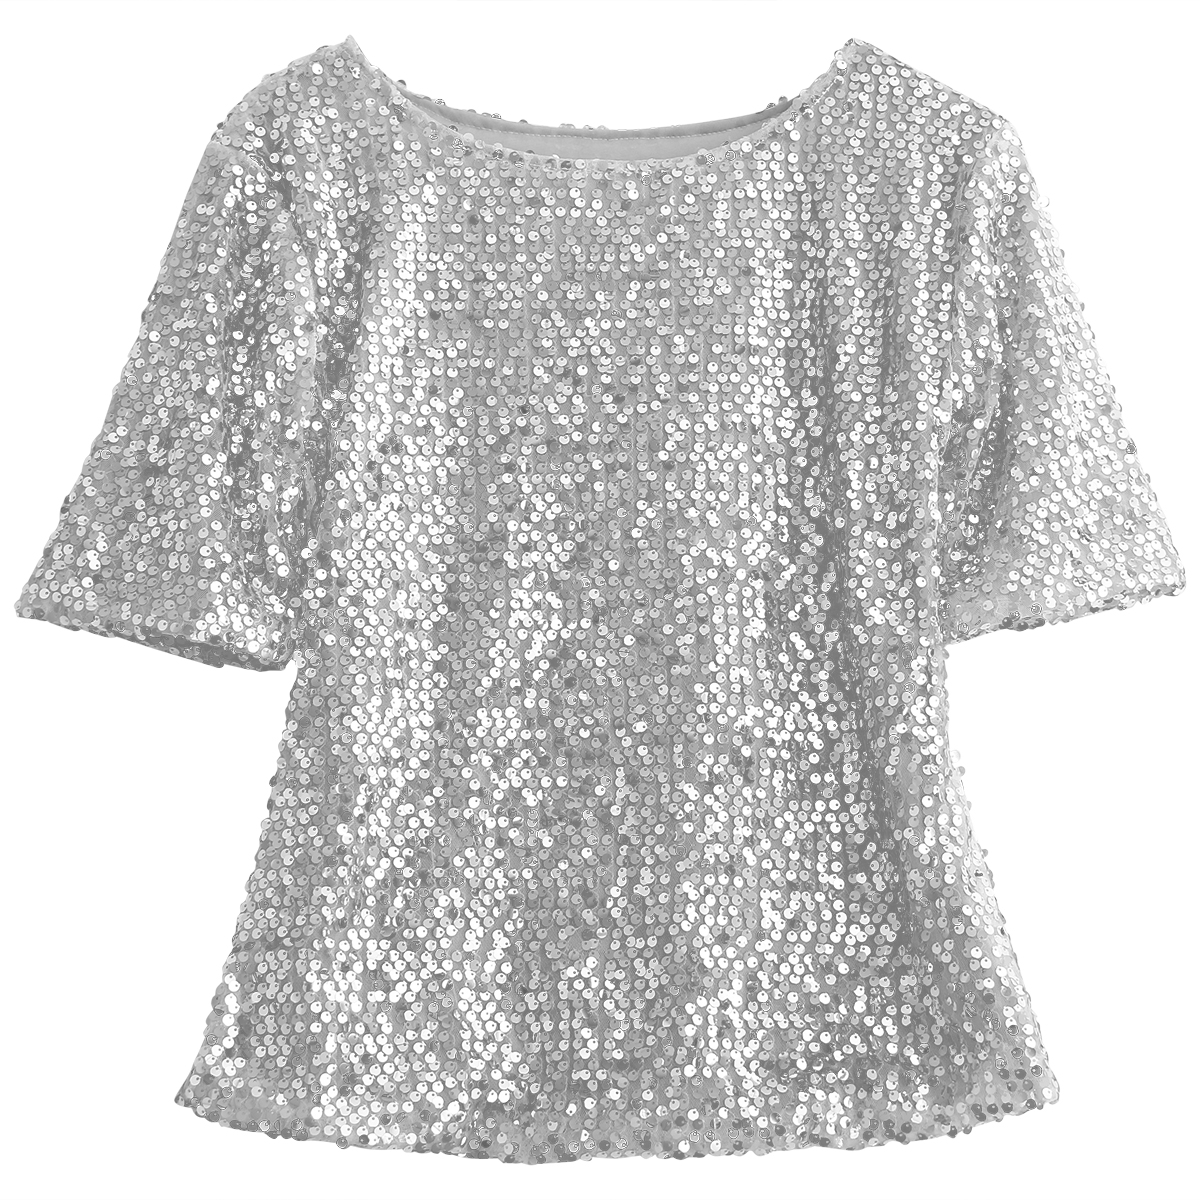 Fashion Ladies Off-shoulder Glistening Sequin Slim Shirt Half Sleeves Tops  Club Party Skew Collar e318e9230f55